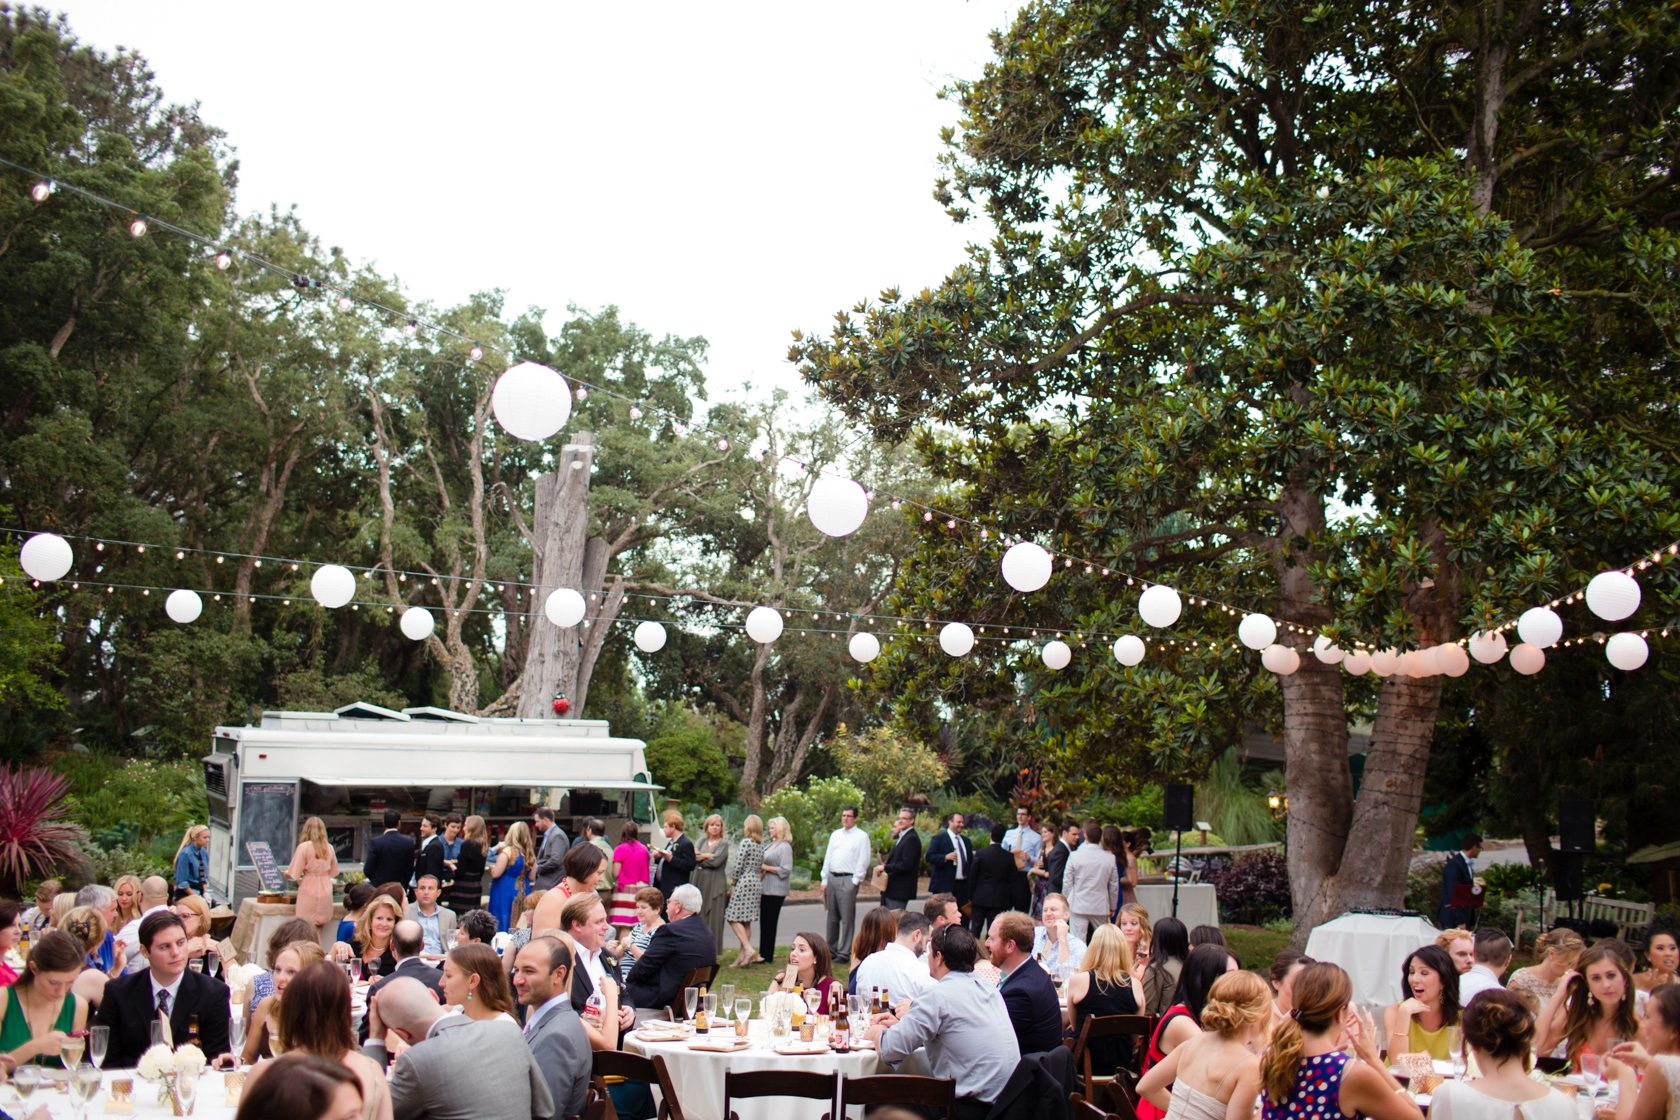 San_Diego_Botanic_Gardens_Wedding_075.jpg